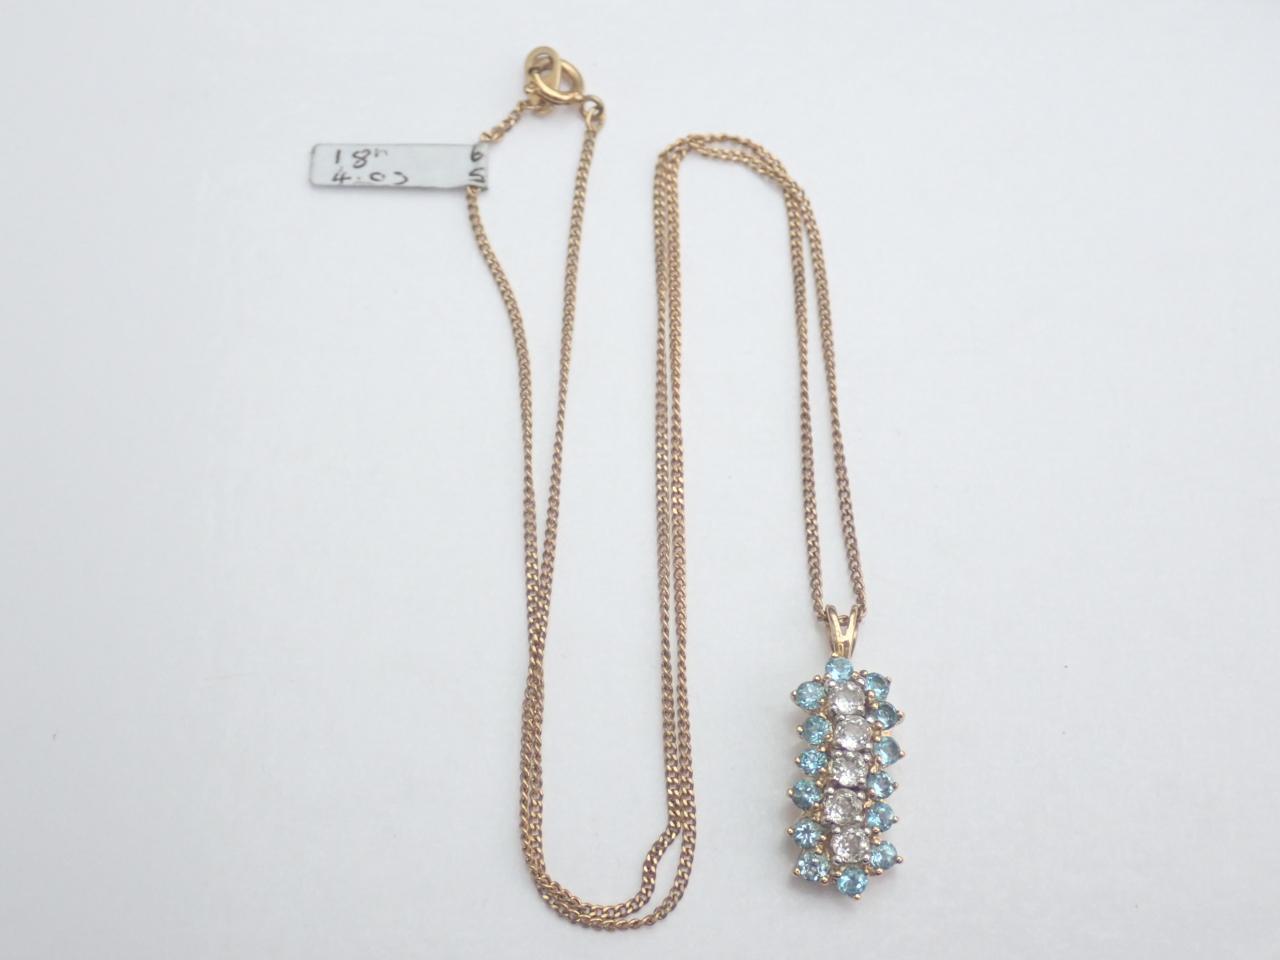 London Blue white Topaz Pendant 375 9k Yellow 18 inch chain Necklace #65